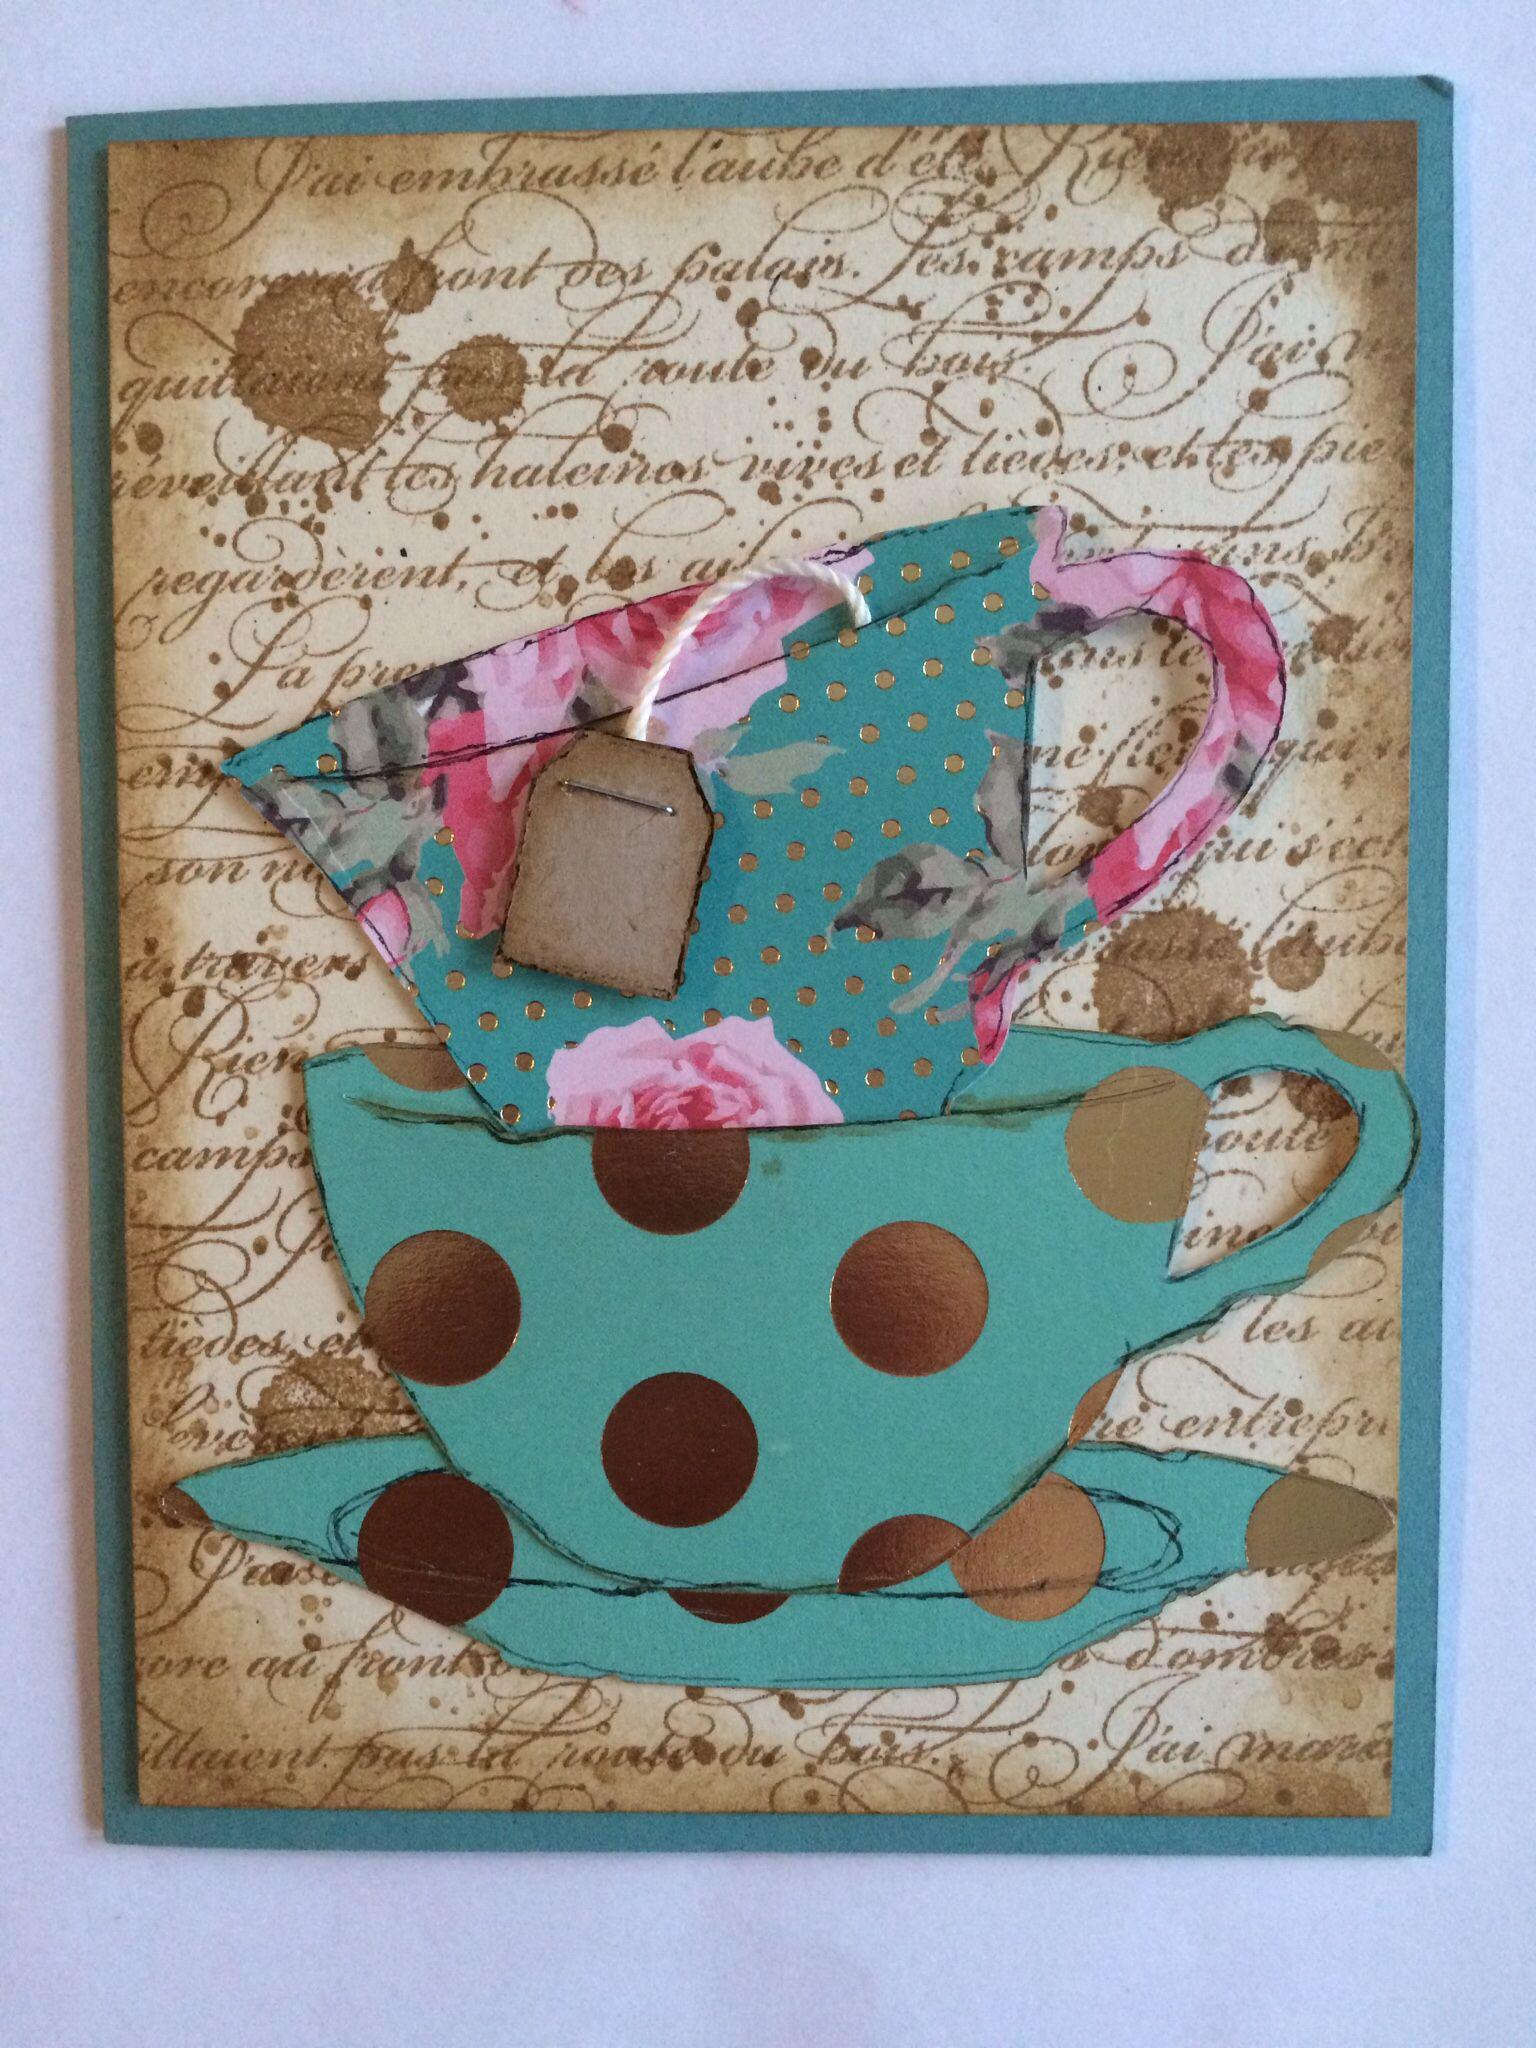 tim holtz tea time designed by me deko allgemein pinterest kaffeebecher ordner und karten. Black Bedroom Furniture Sets. Home Design Ideas